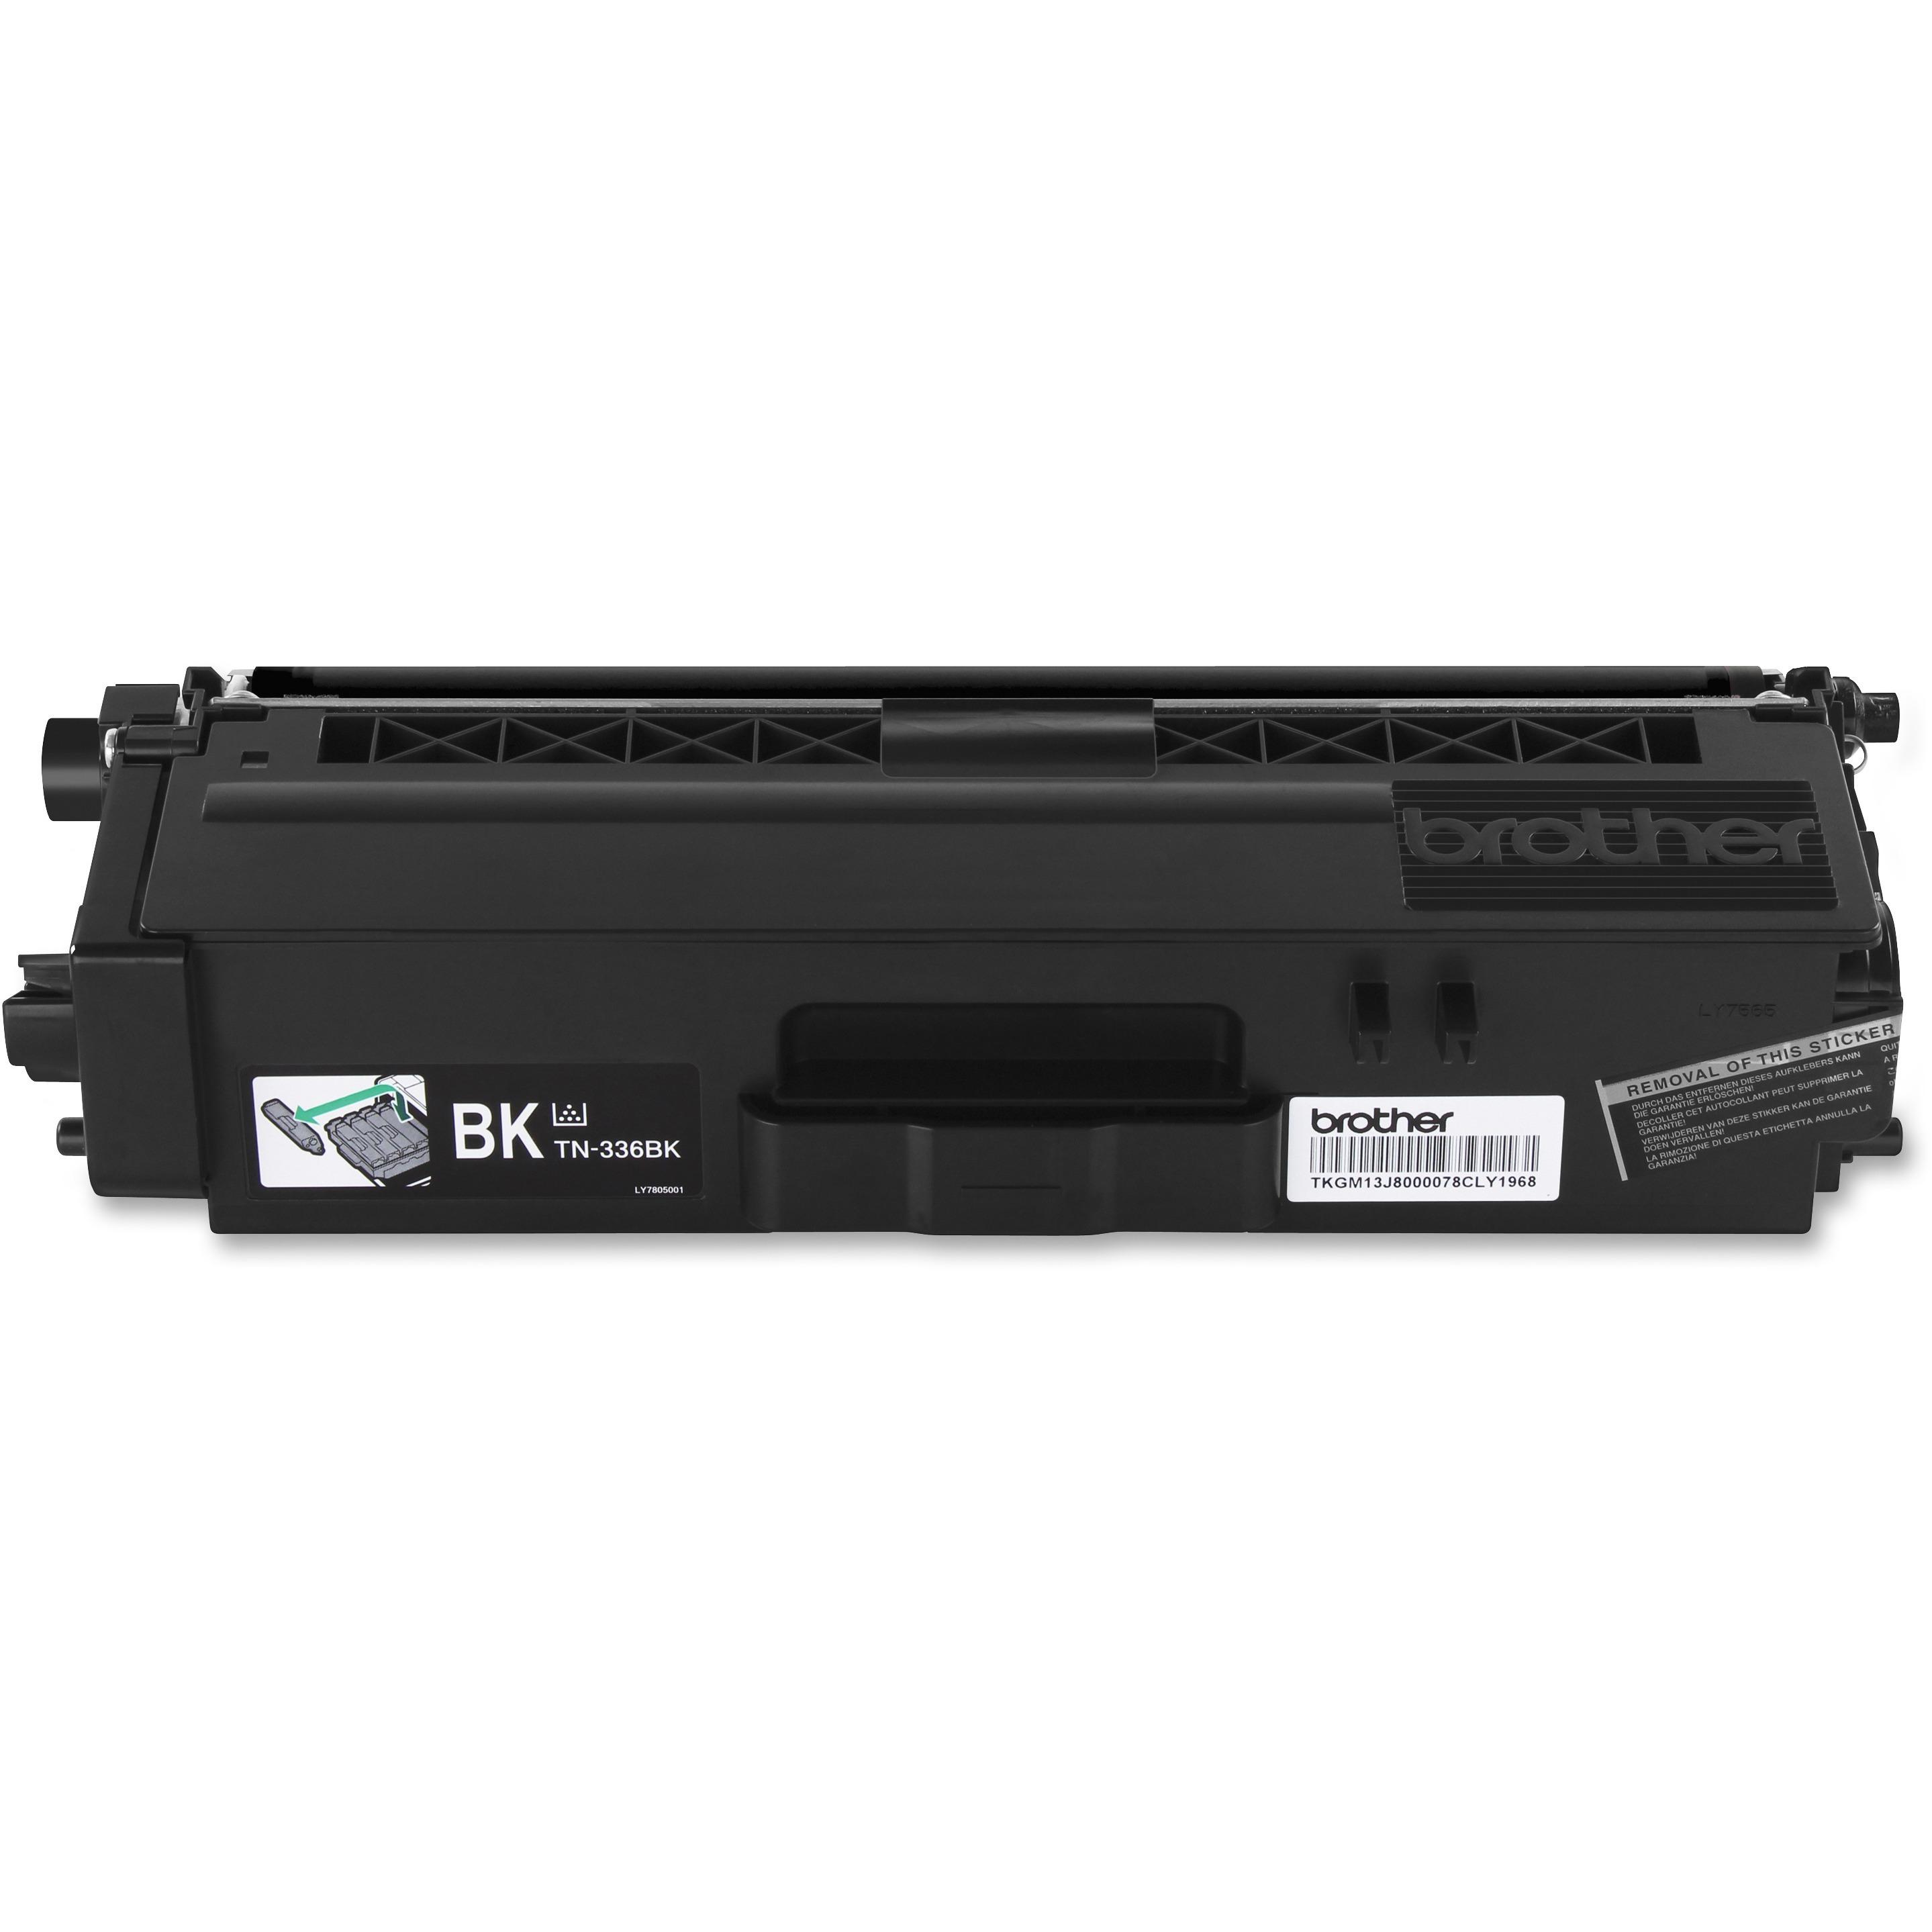 5 Pack Set TN-336BK TN-336 HY Black /& Color Printer Toner Cartridge for Brother